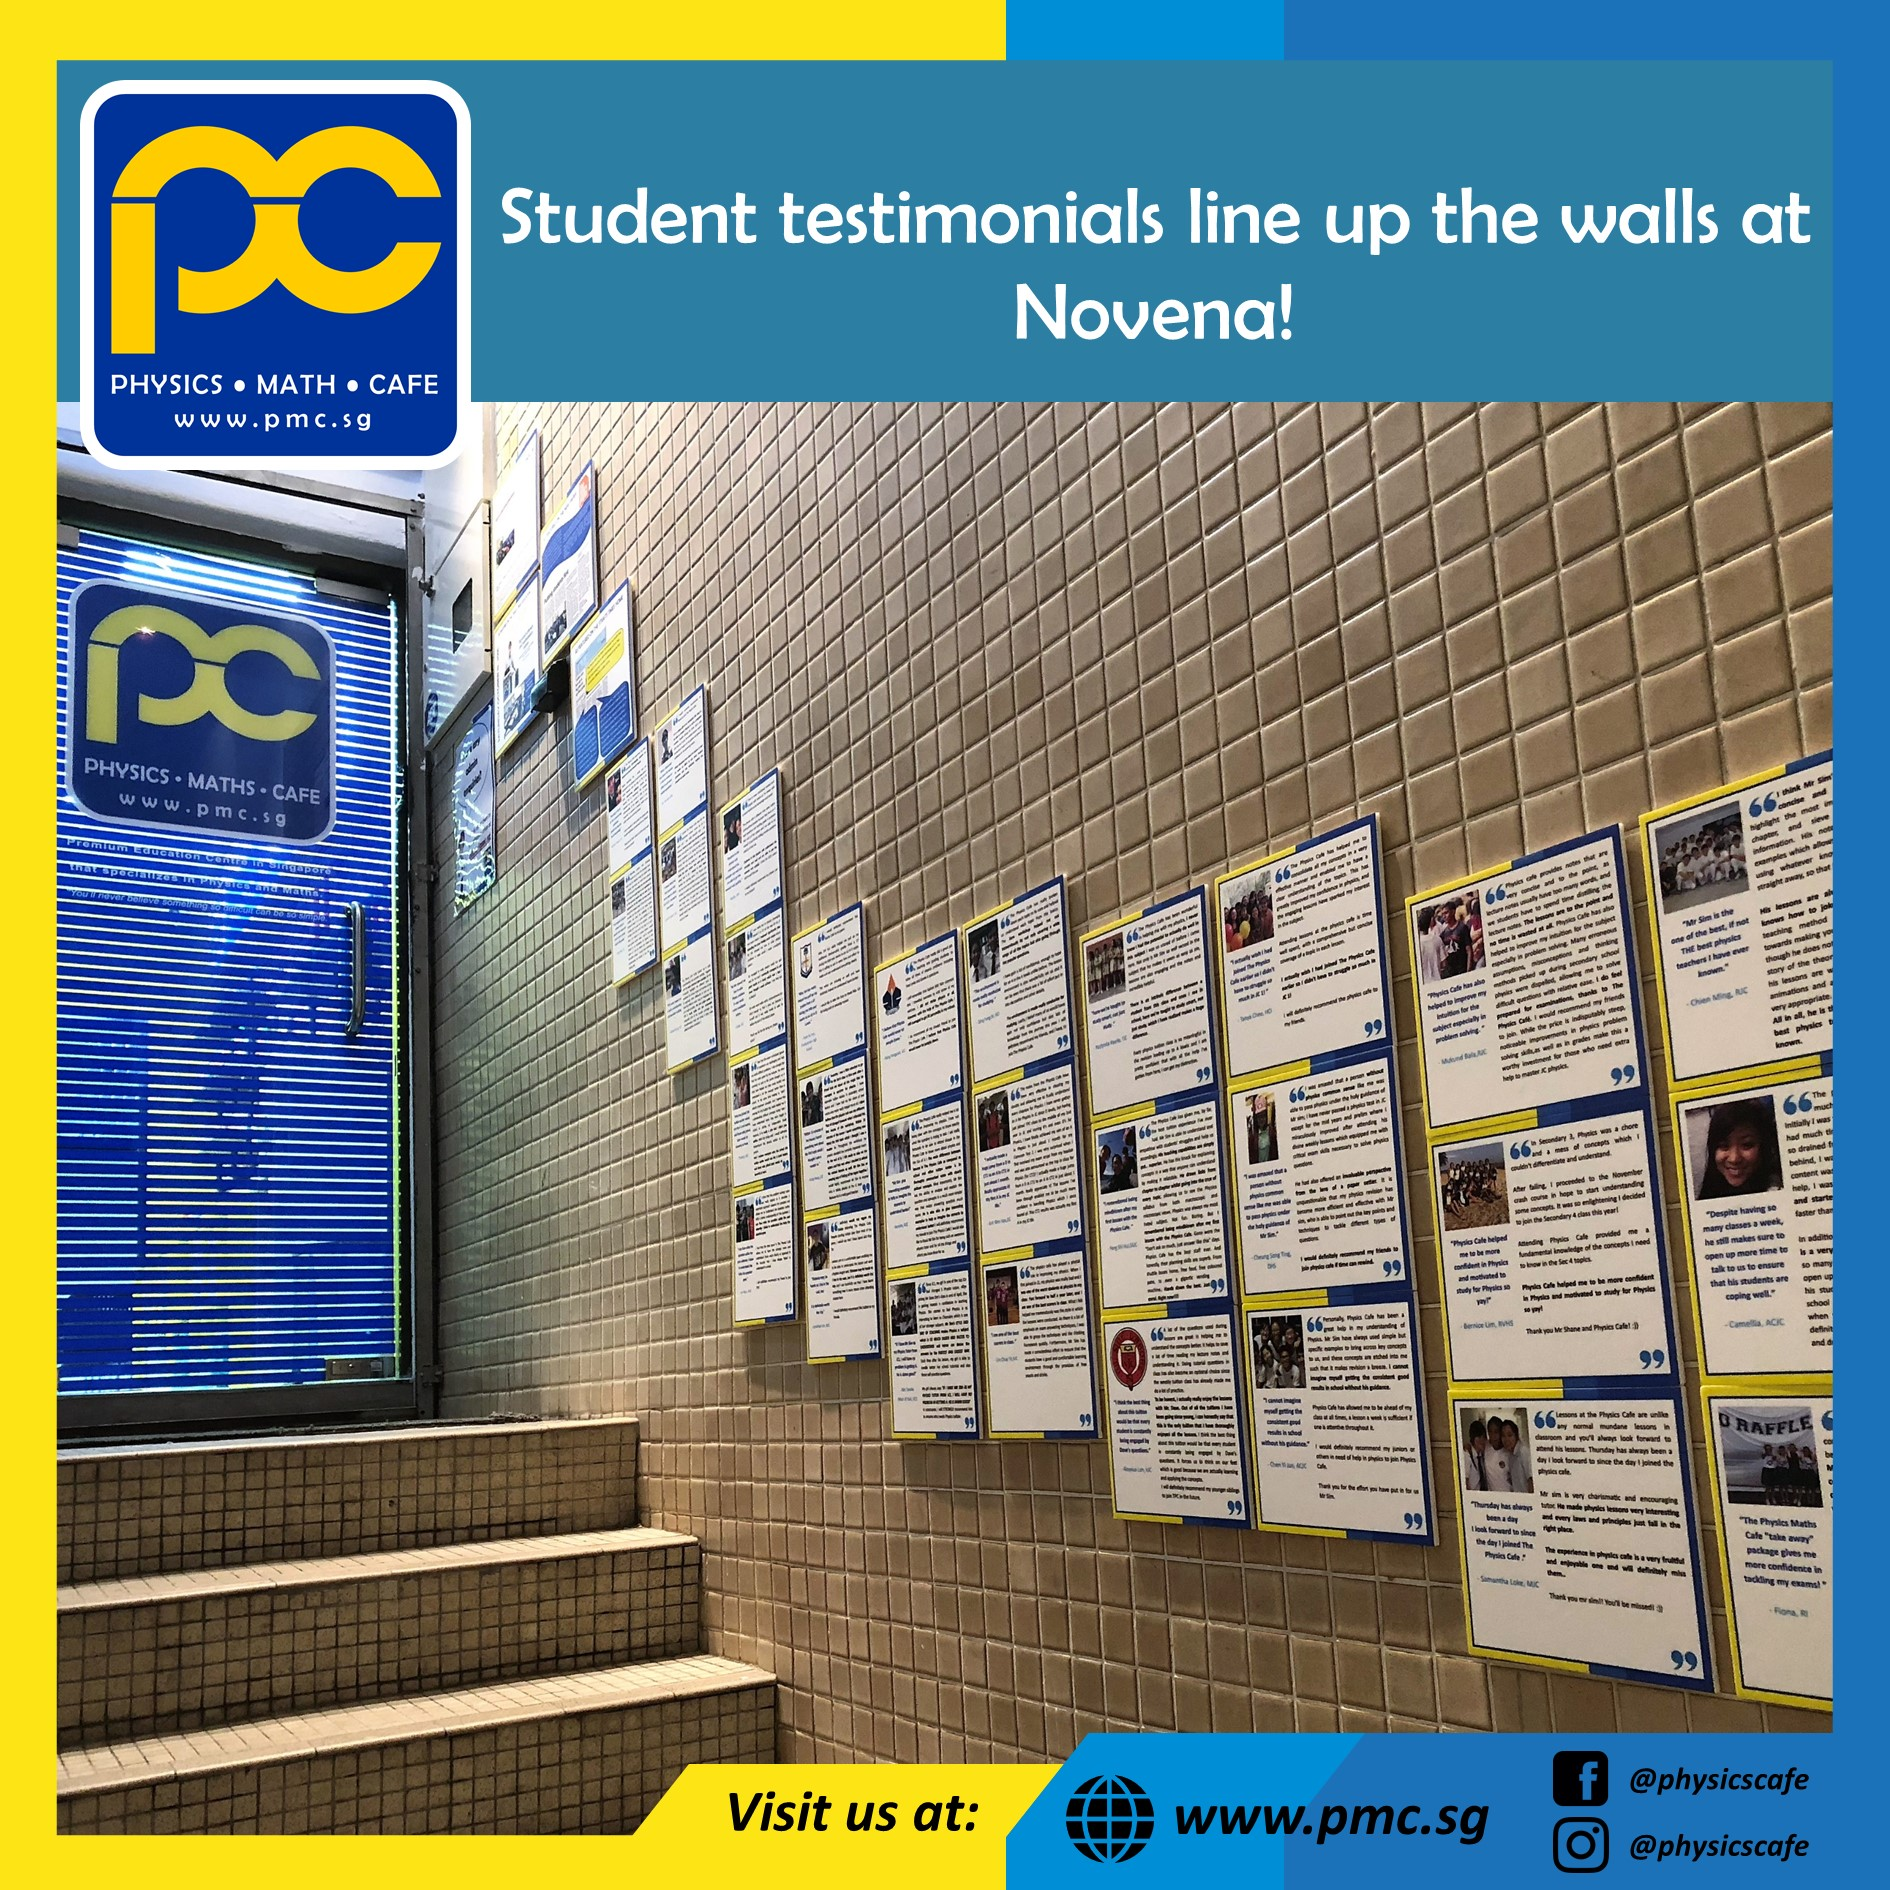 Students' testimonials